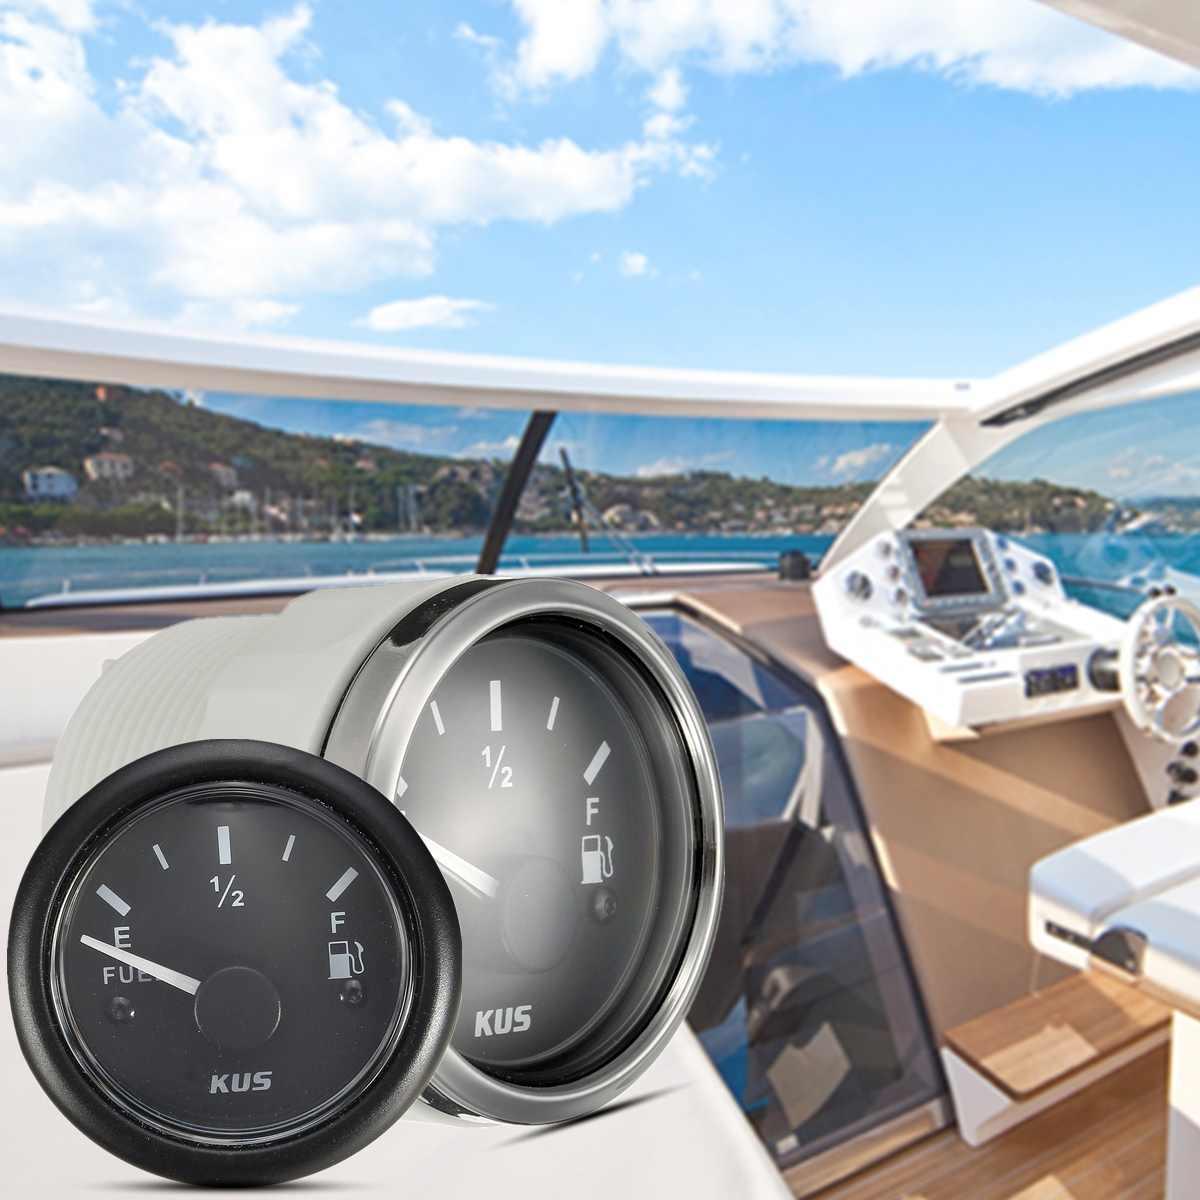 400mm Fuel /& Water Level Gauge Sensor for Marine Boat Yacht RV Parts